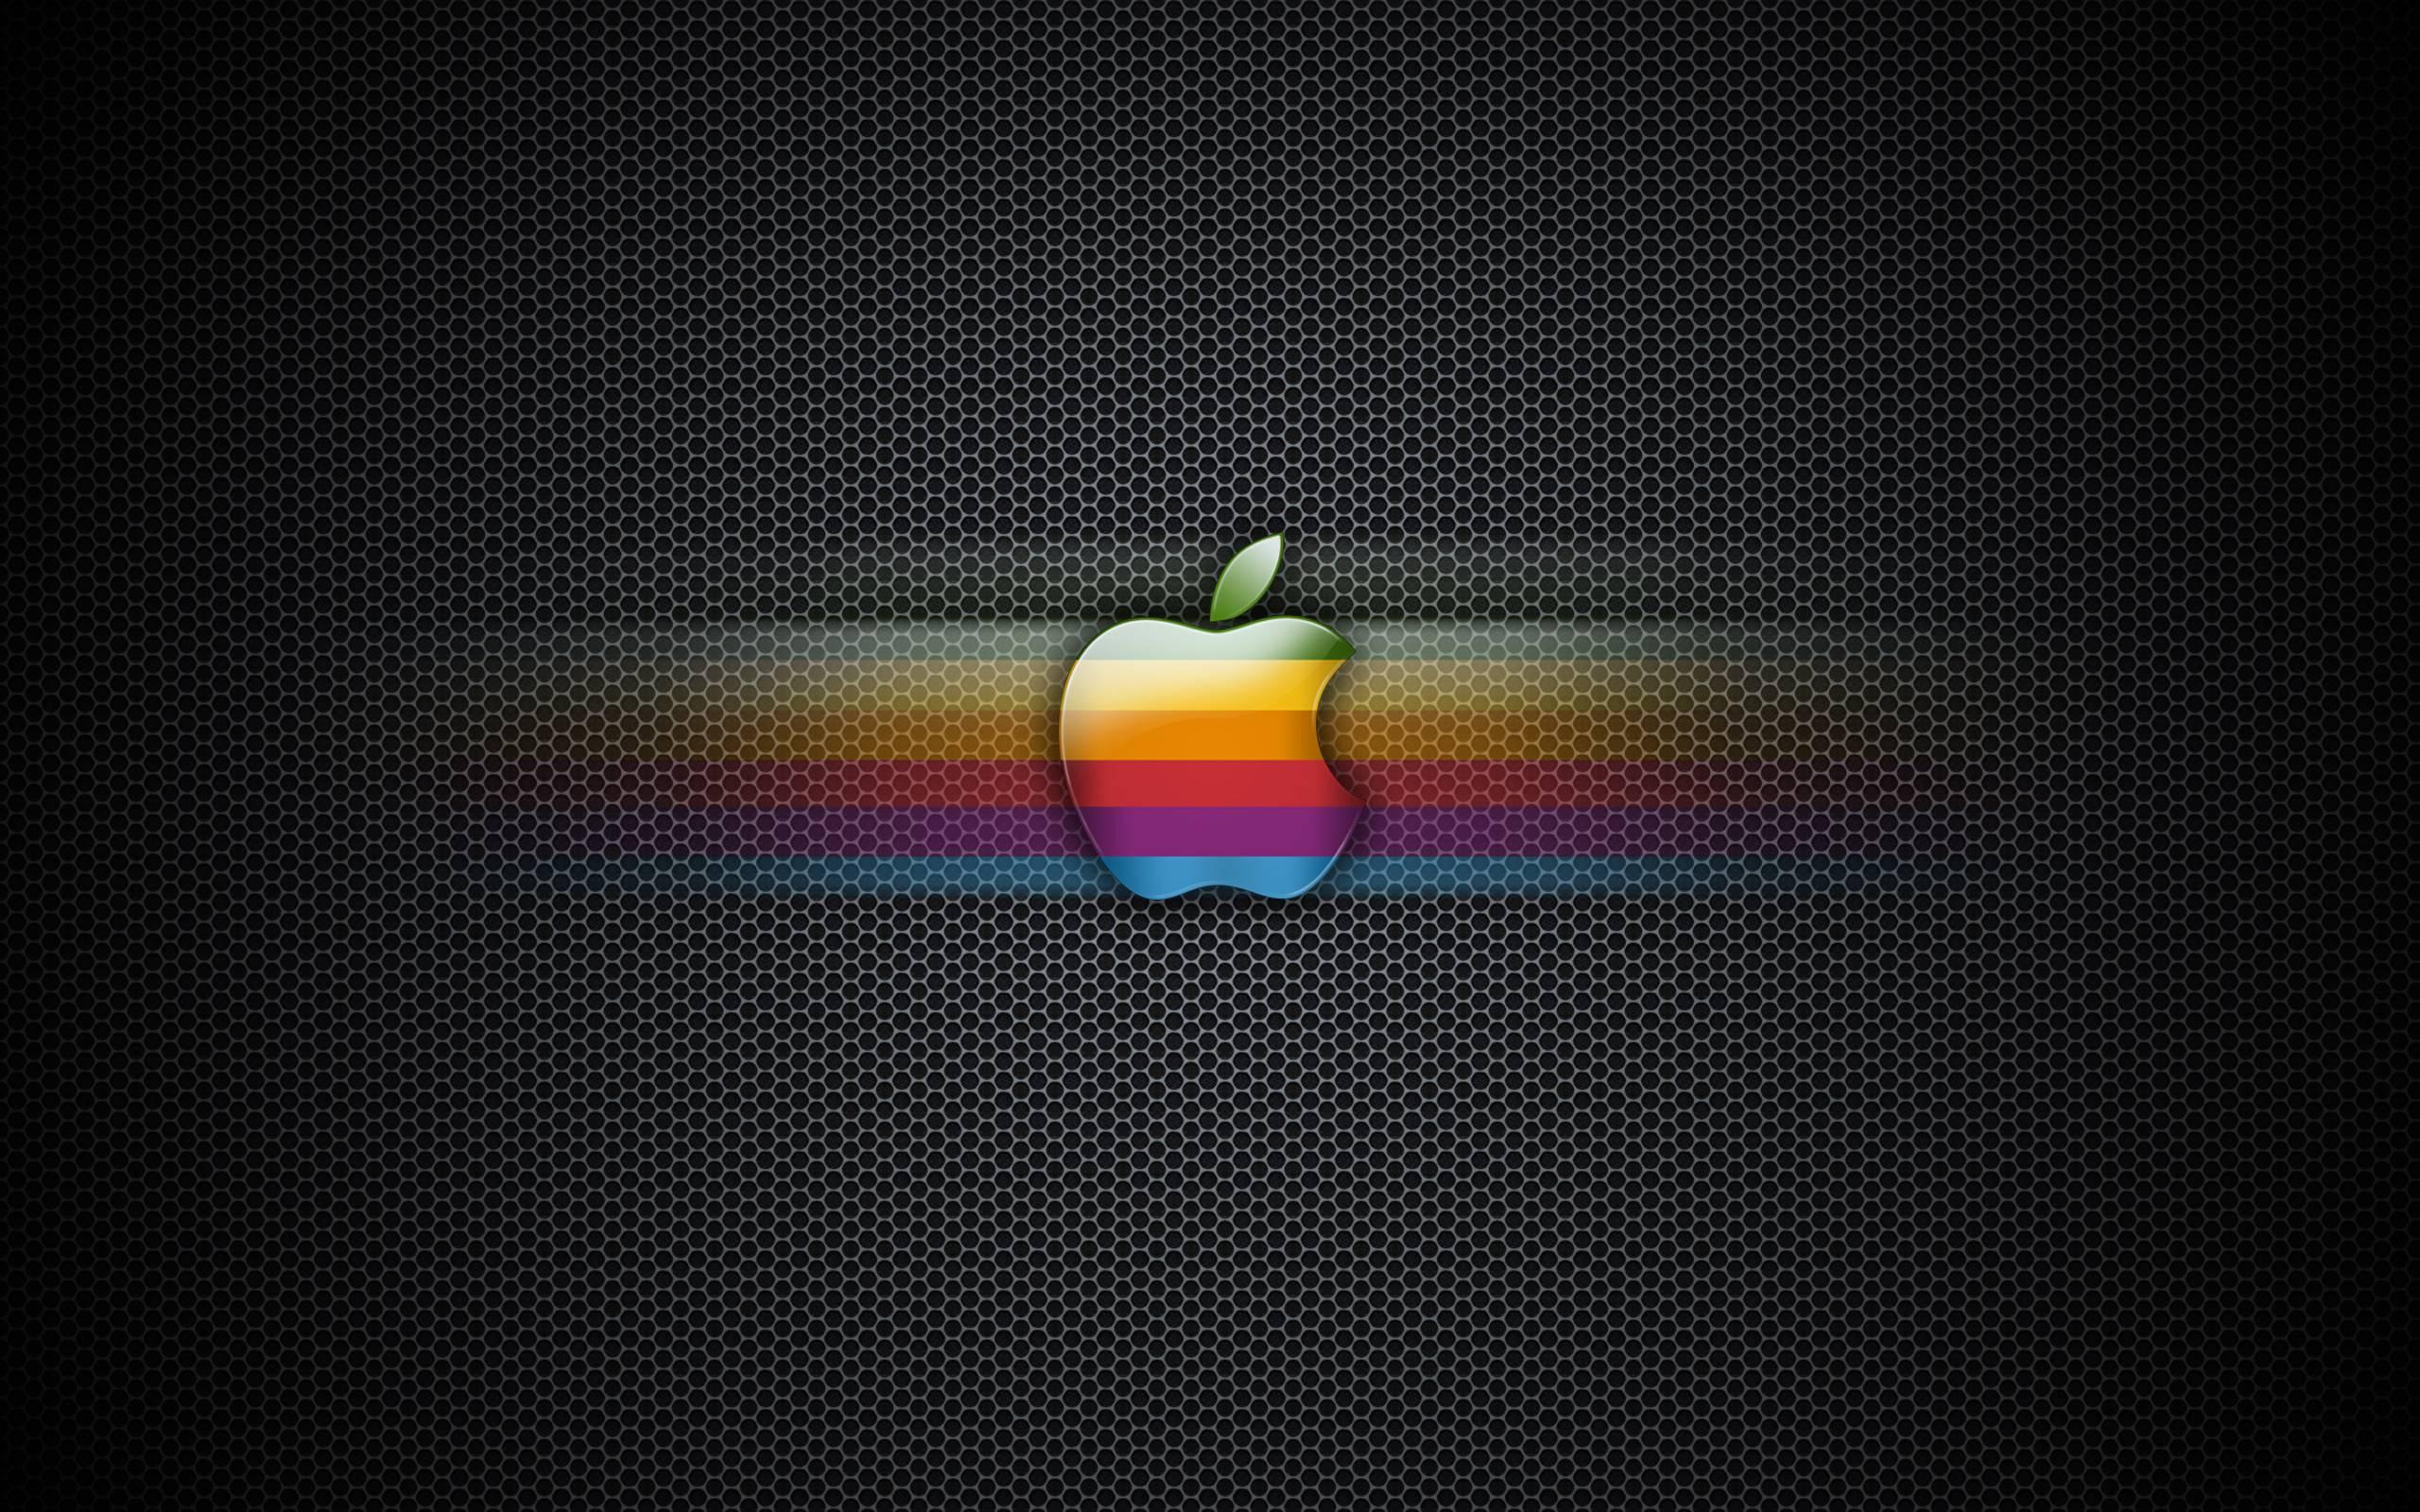 Wallpaper download apple - Apple Technology Hd Wallpapers Hd Wallpapers Inn